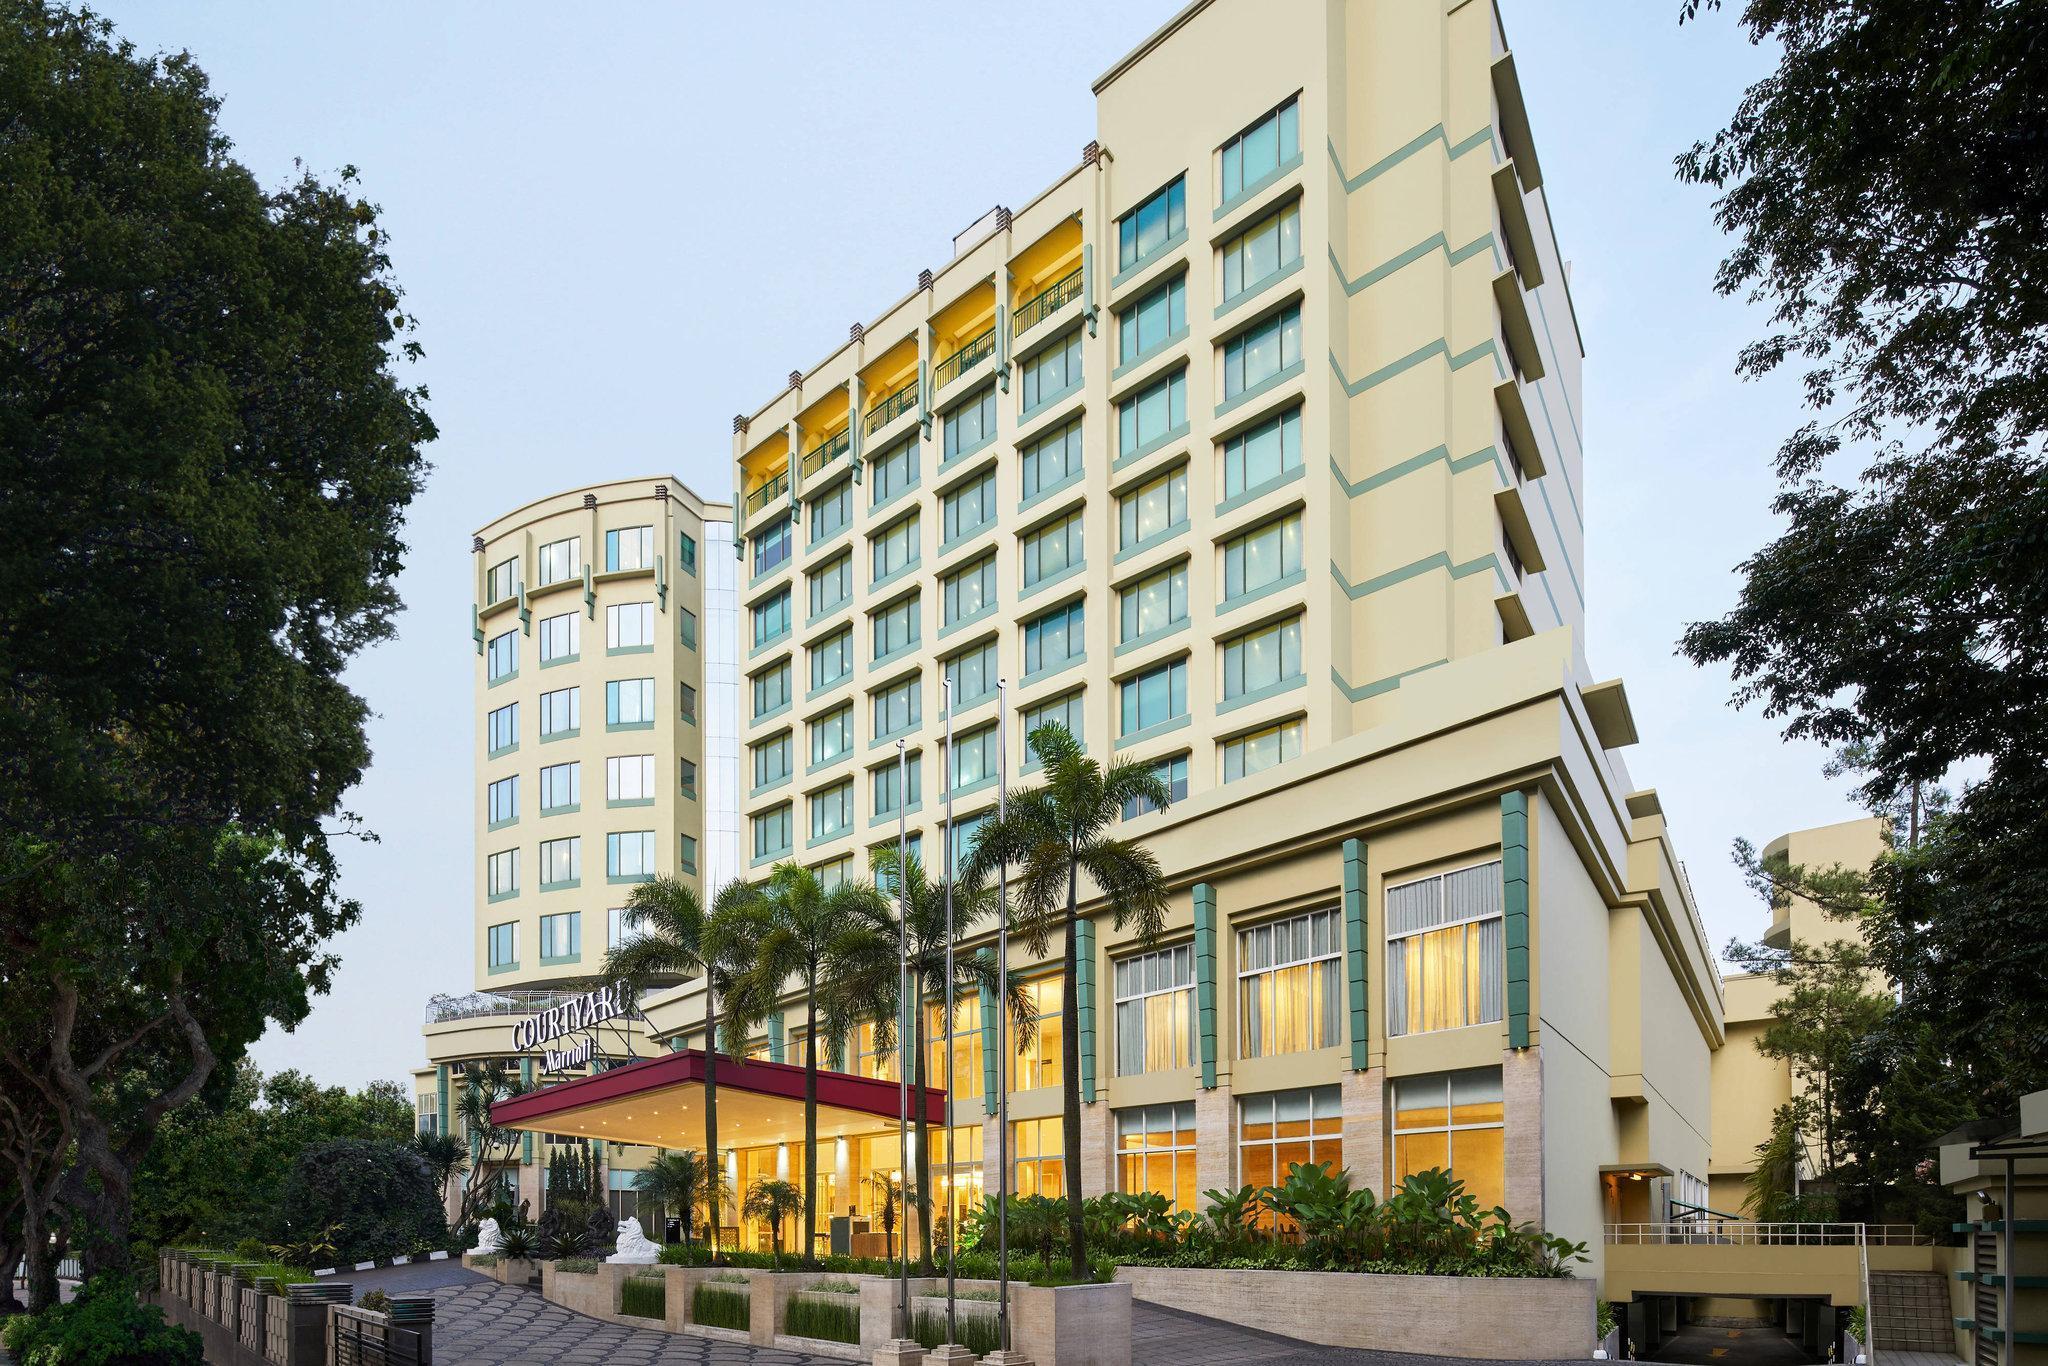 Courtyard by Marriot Bandung Dago (Formerly Holiday Inn Bandung Dago)